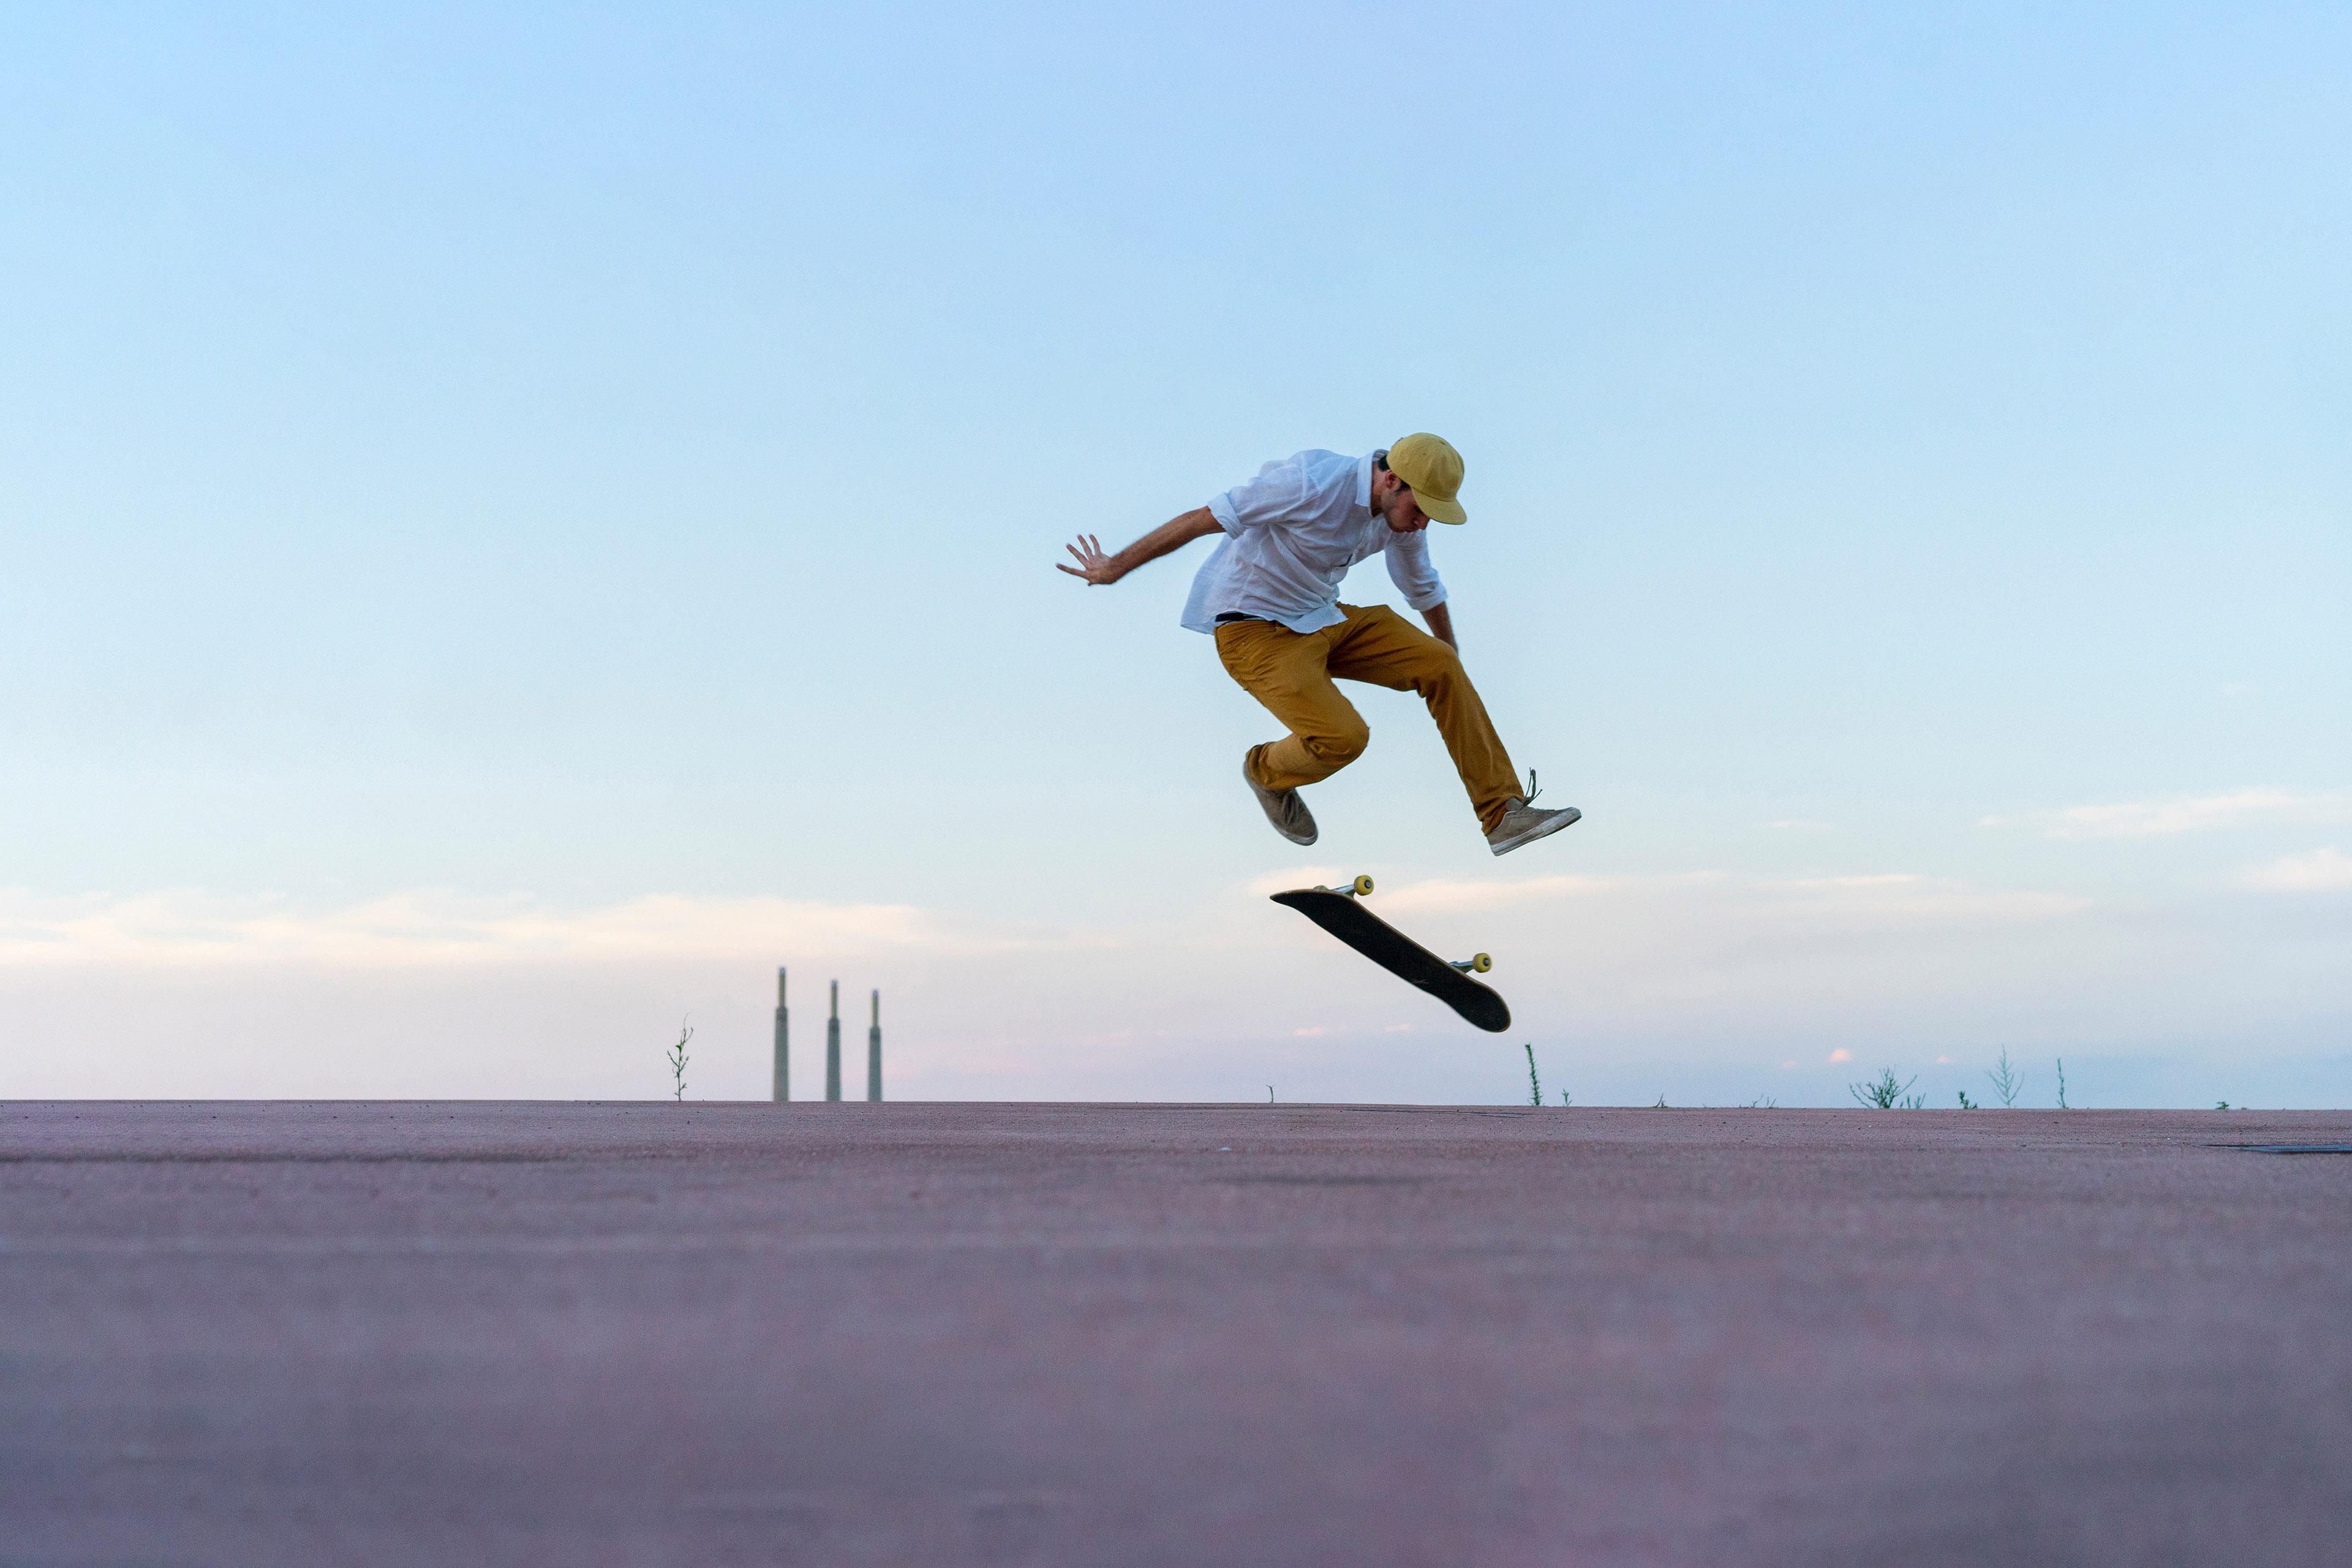 Man doing a skateboard trick on a lane at dusk